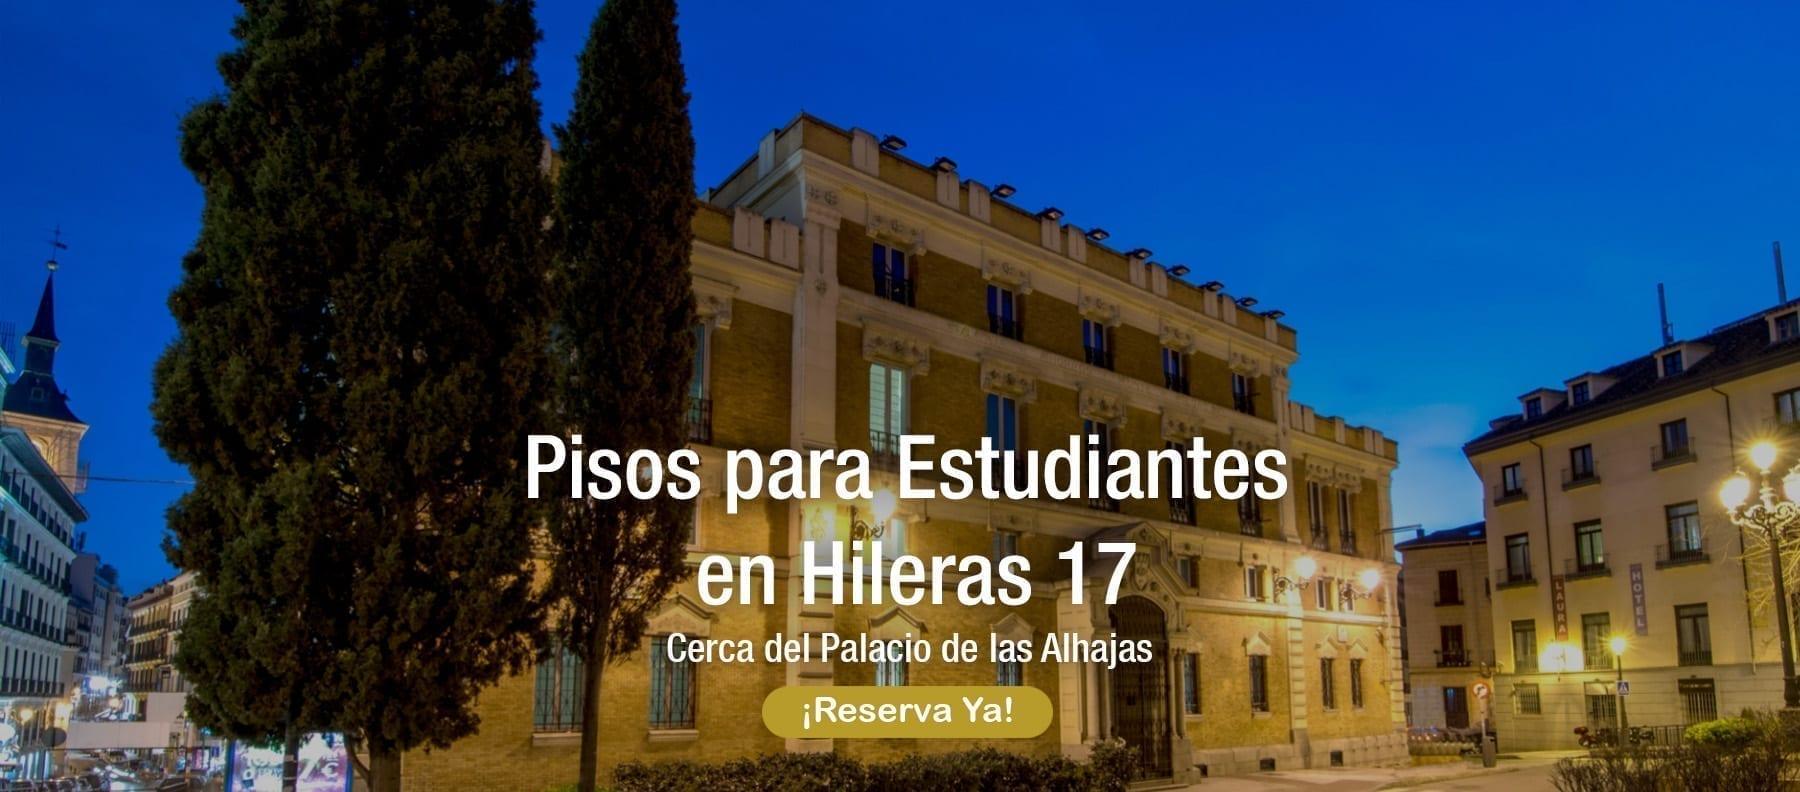 pisos para estudiantes hileras 17 madrid